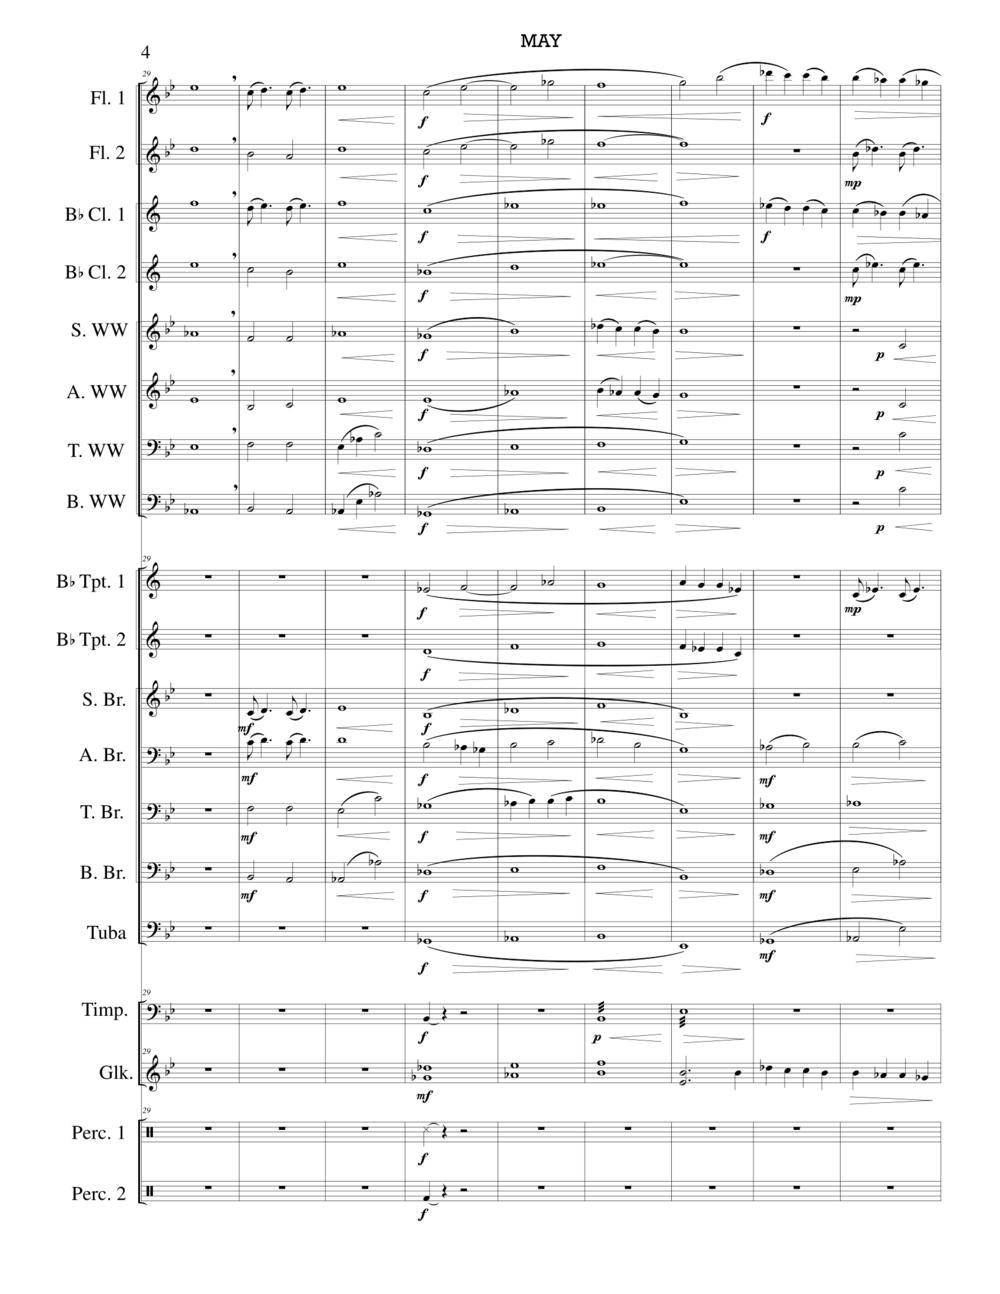 MaySpringDawn - Full Score-06.png